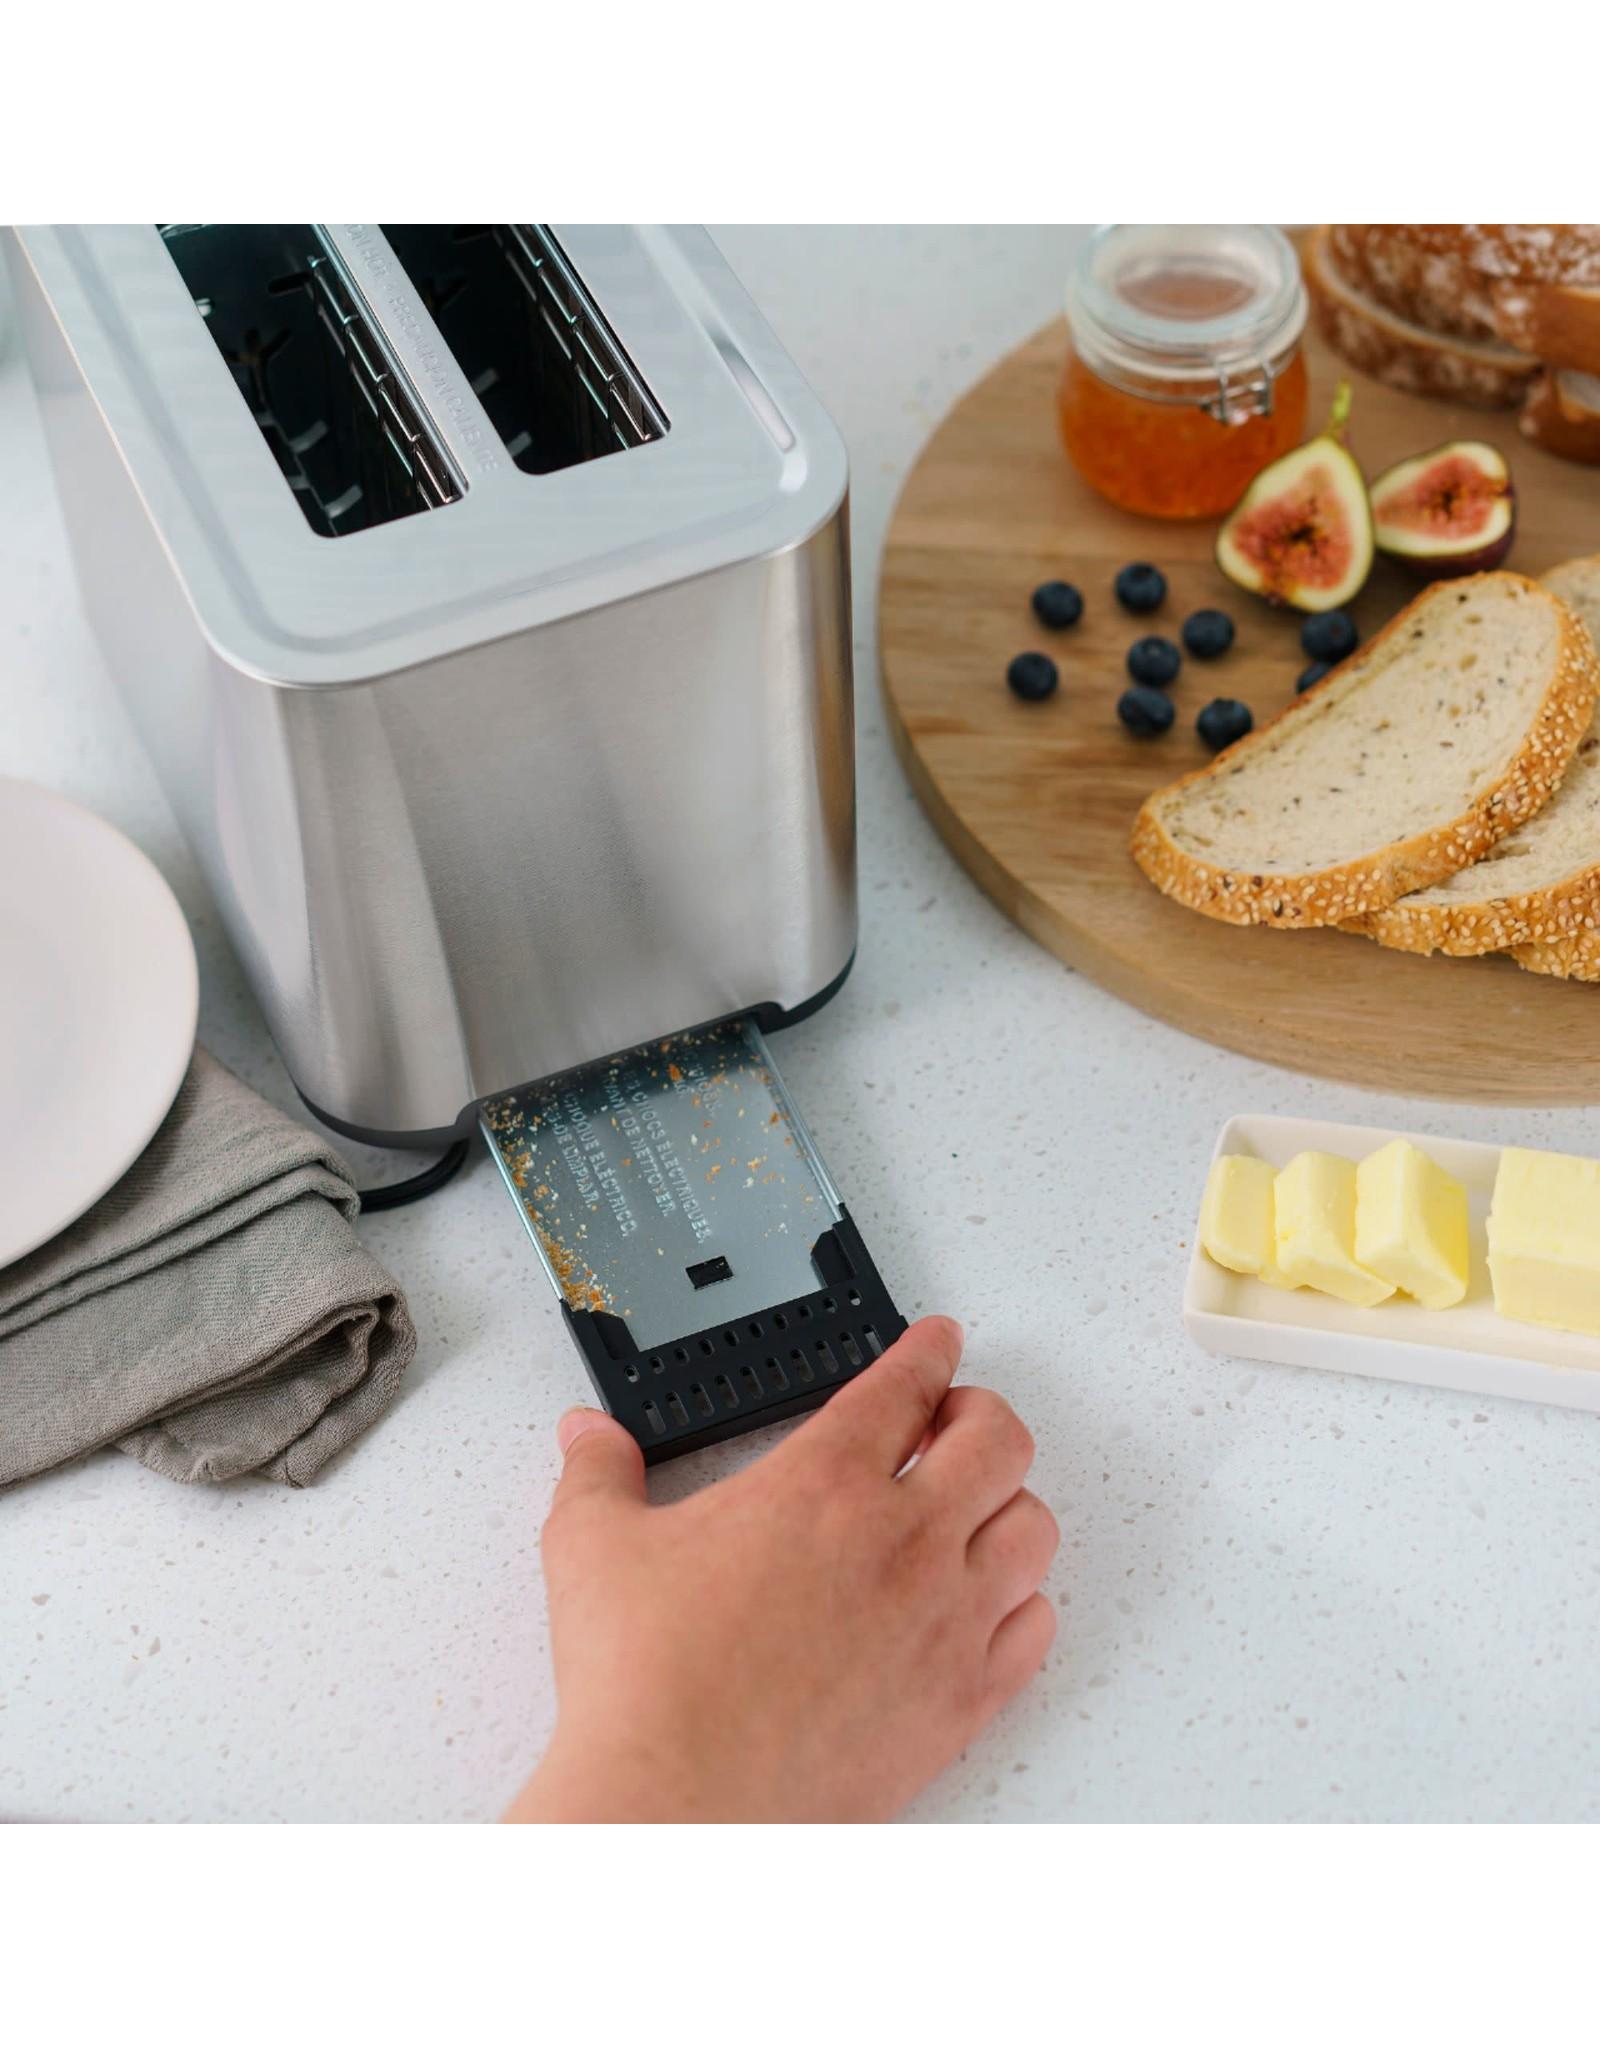 Bella pro 90104 Bella Pro Series - 2-Slice Digital Touchscreen Toaster - Stainless Steel